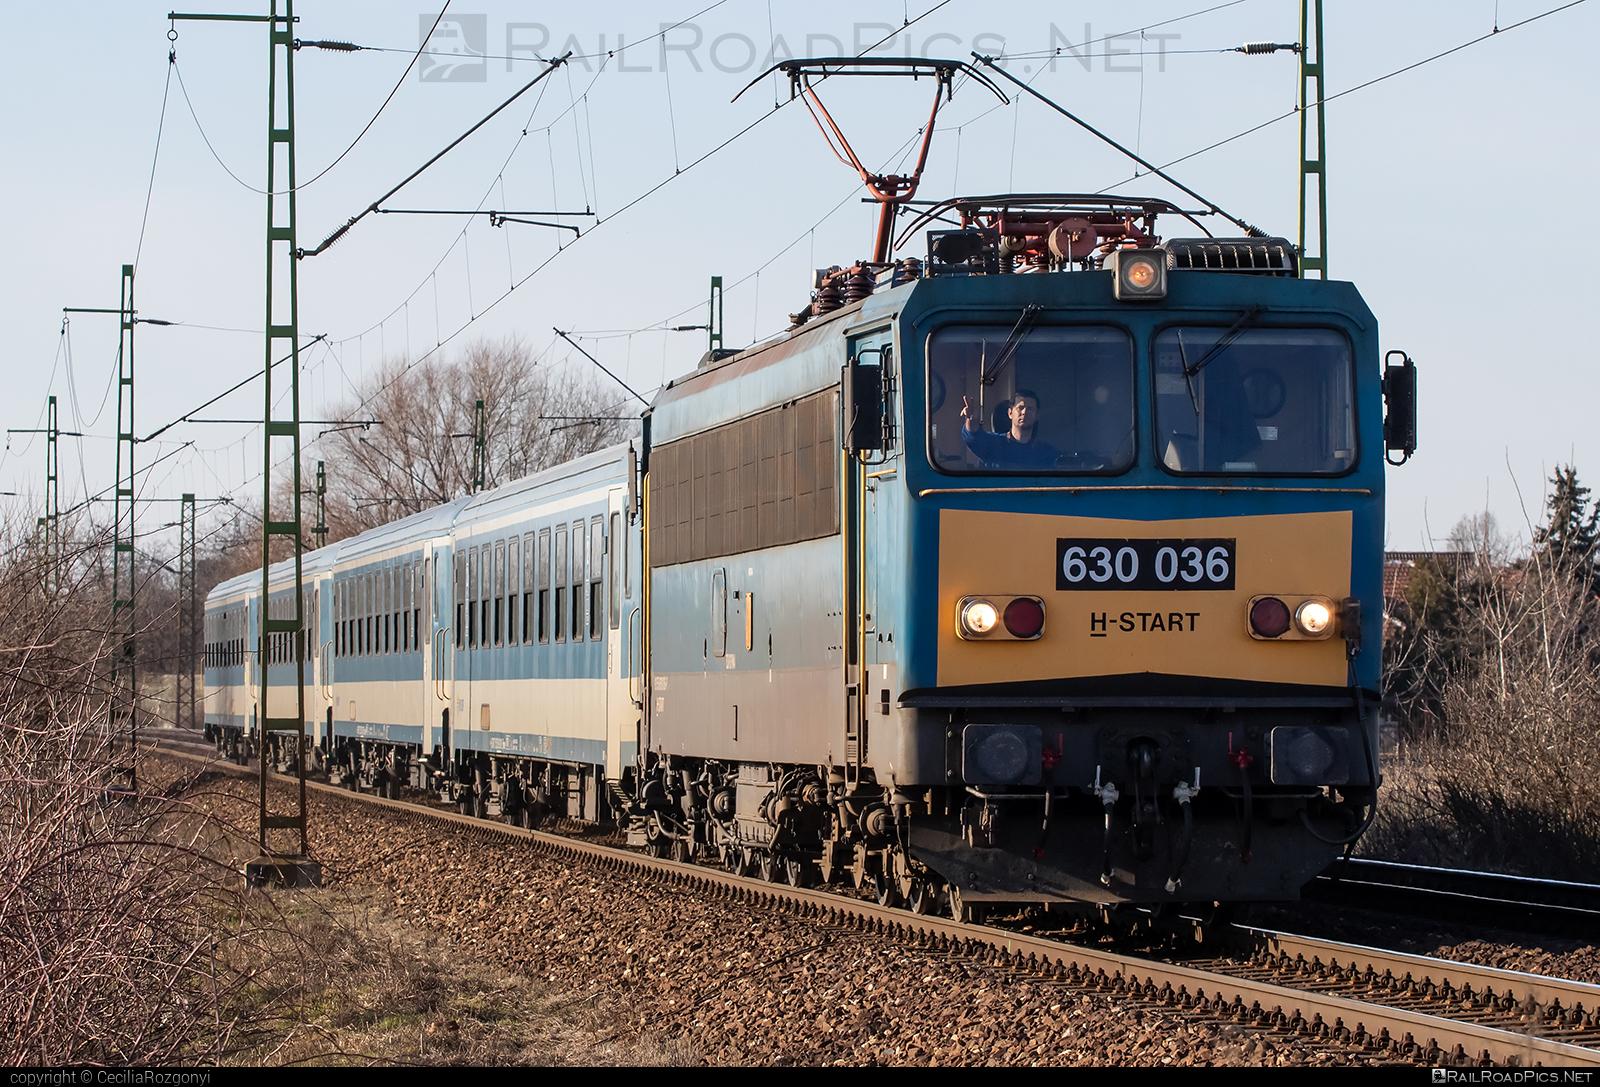 Ganz-MÁVAG VM15-4 - 630 036 operated by MÁV-START ZRt. #ganz63 #ganz630 #ganzmavag #ganzmavag63 #ganzmavag630 #ganzmavagvm154 #locomotive630 #mav #mavstart #mavstartzrt #v63locomotive